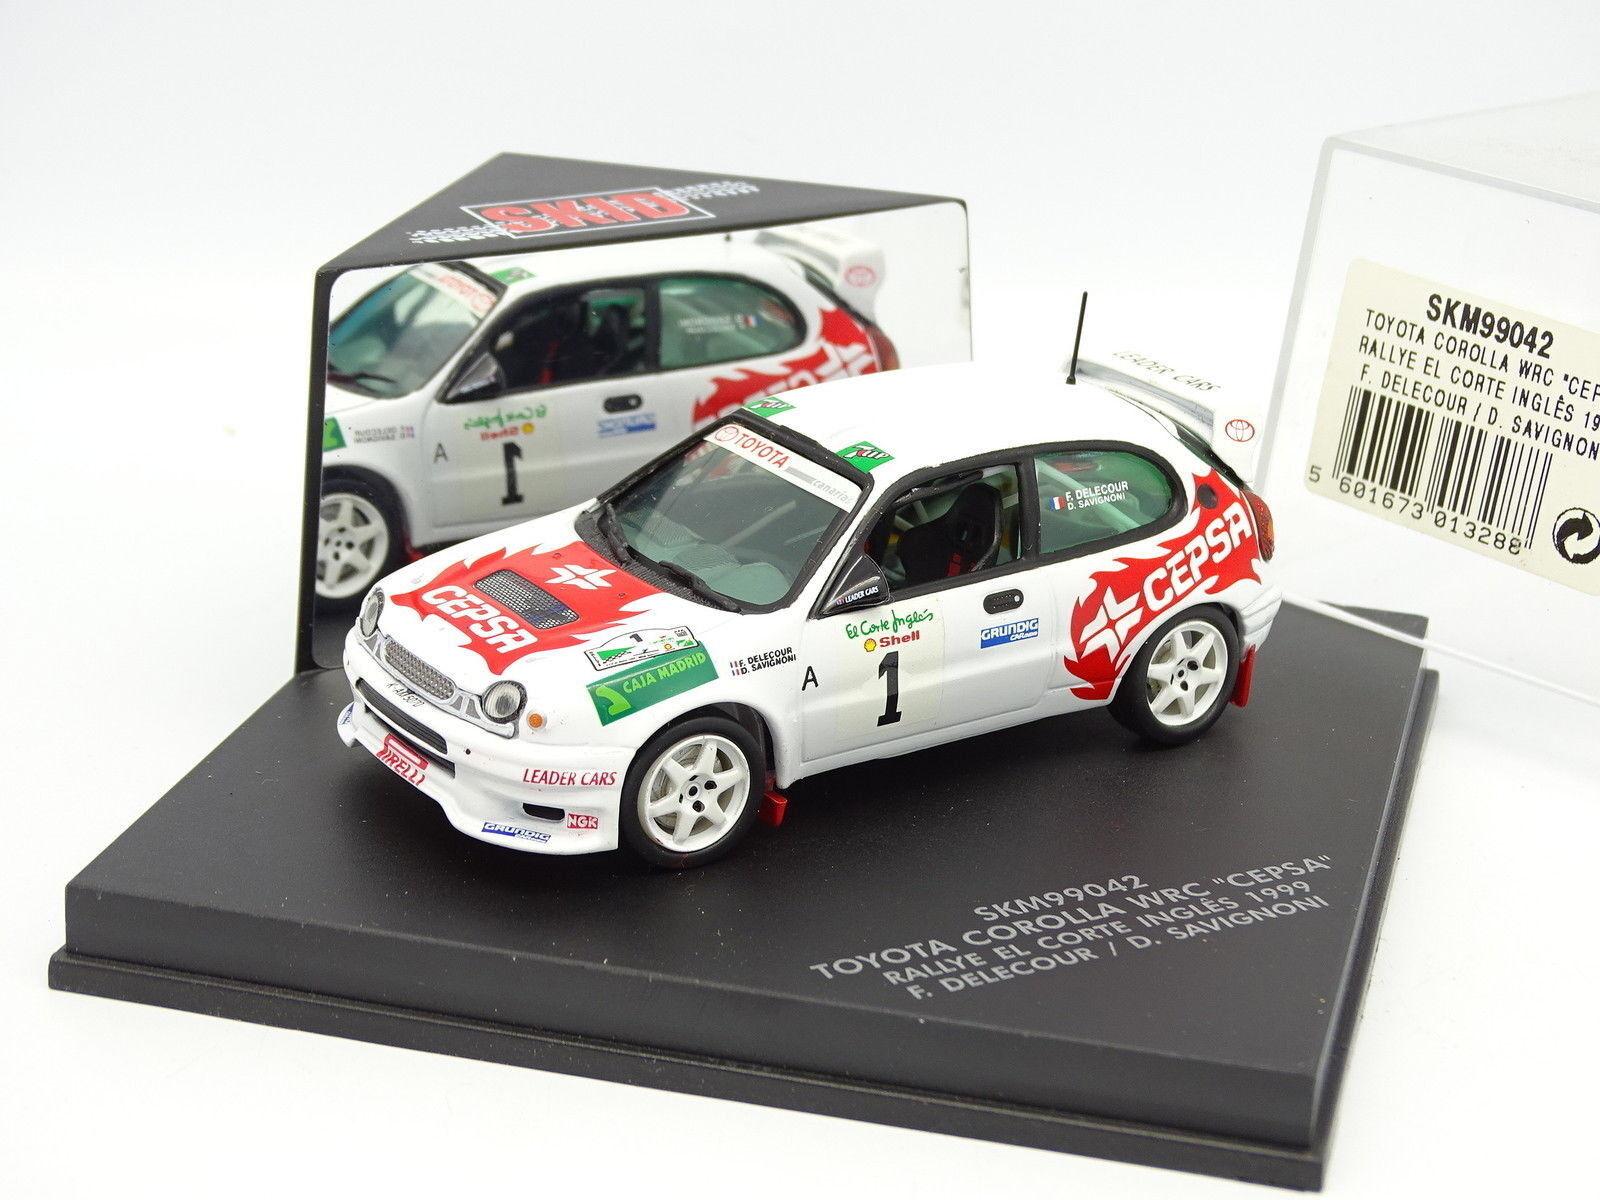 Skid 1 43 - Toyota Corlla WRC Cepsa Rallye El Corte Ingles 1999 Delecour